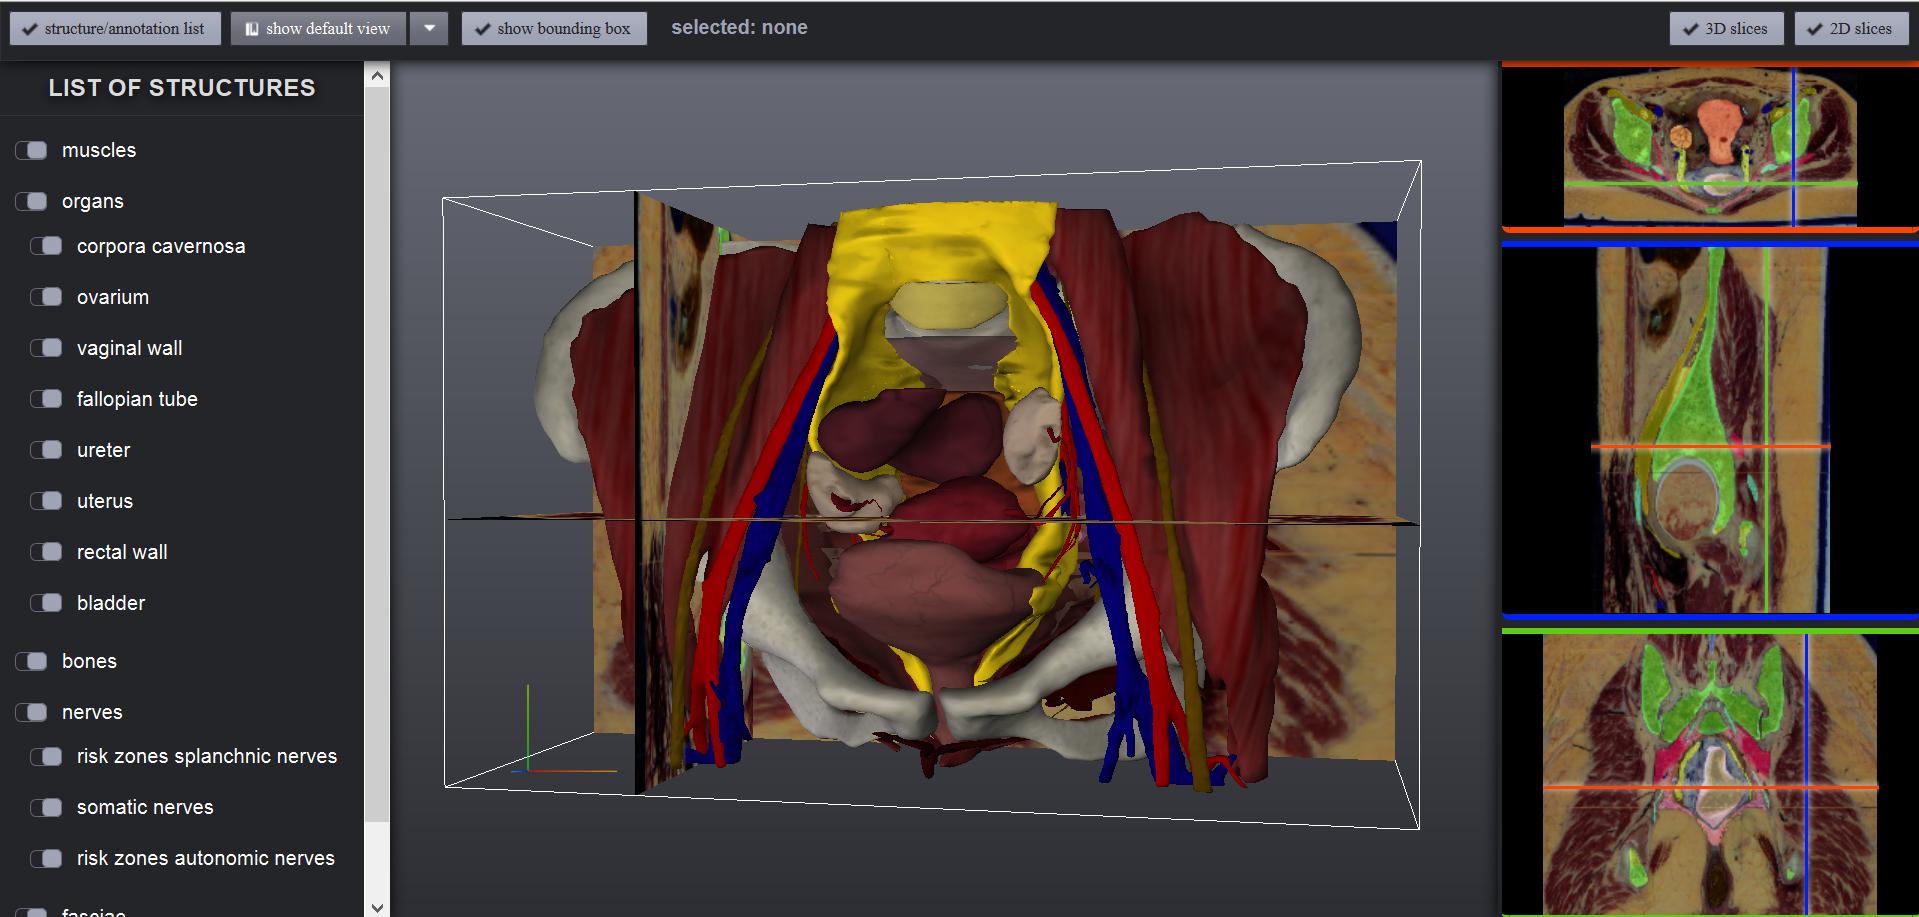 The Online Anatomical Human Web Based Anatomy Education